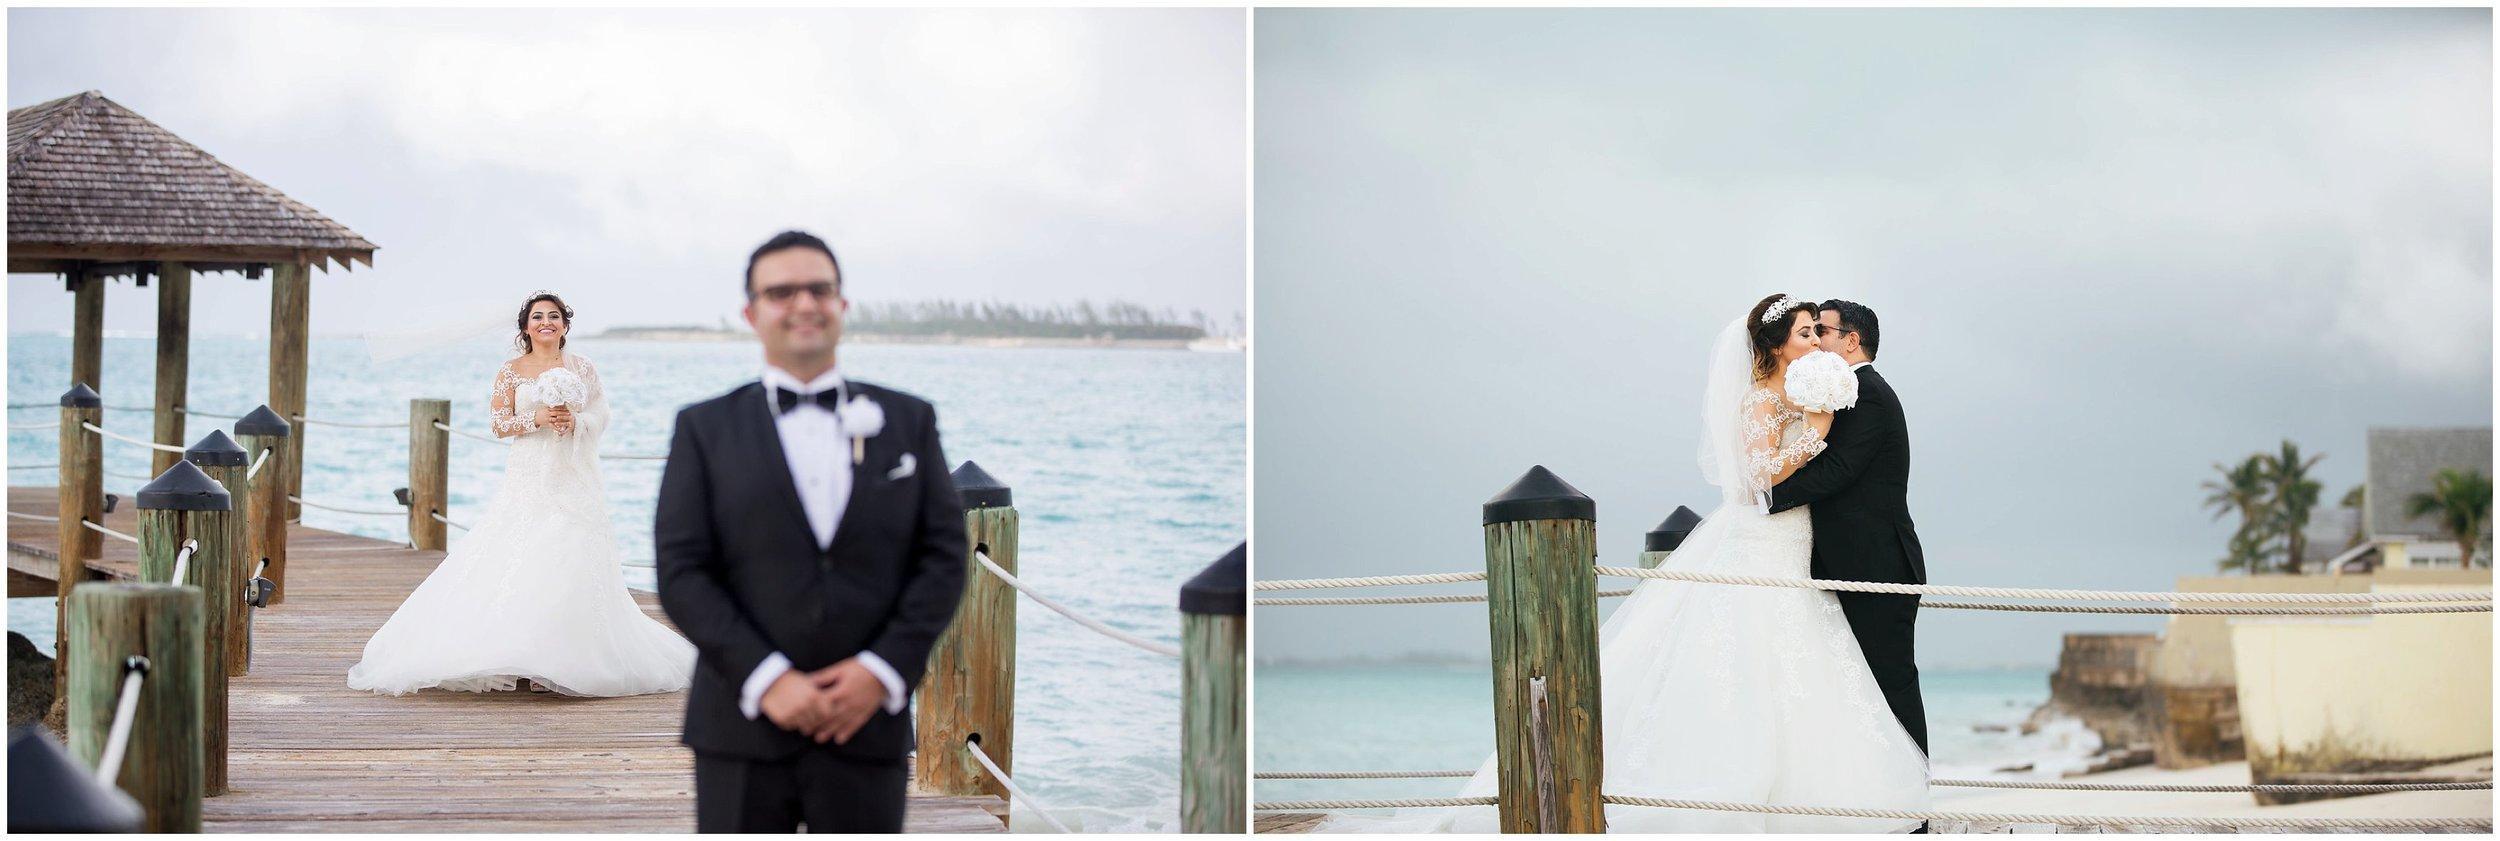 Le Cape Weddings- Destination Wedding Photography -ShayanandNikkie-235-X3_LuxuryDestinationPhotographer.jpg